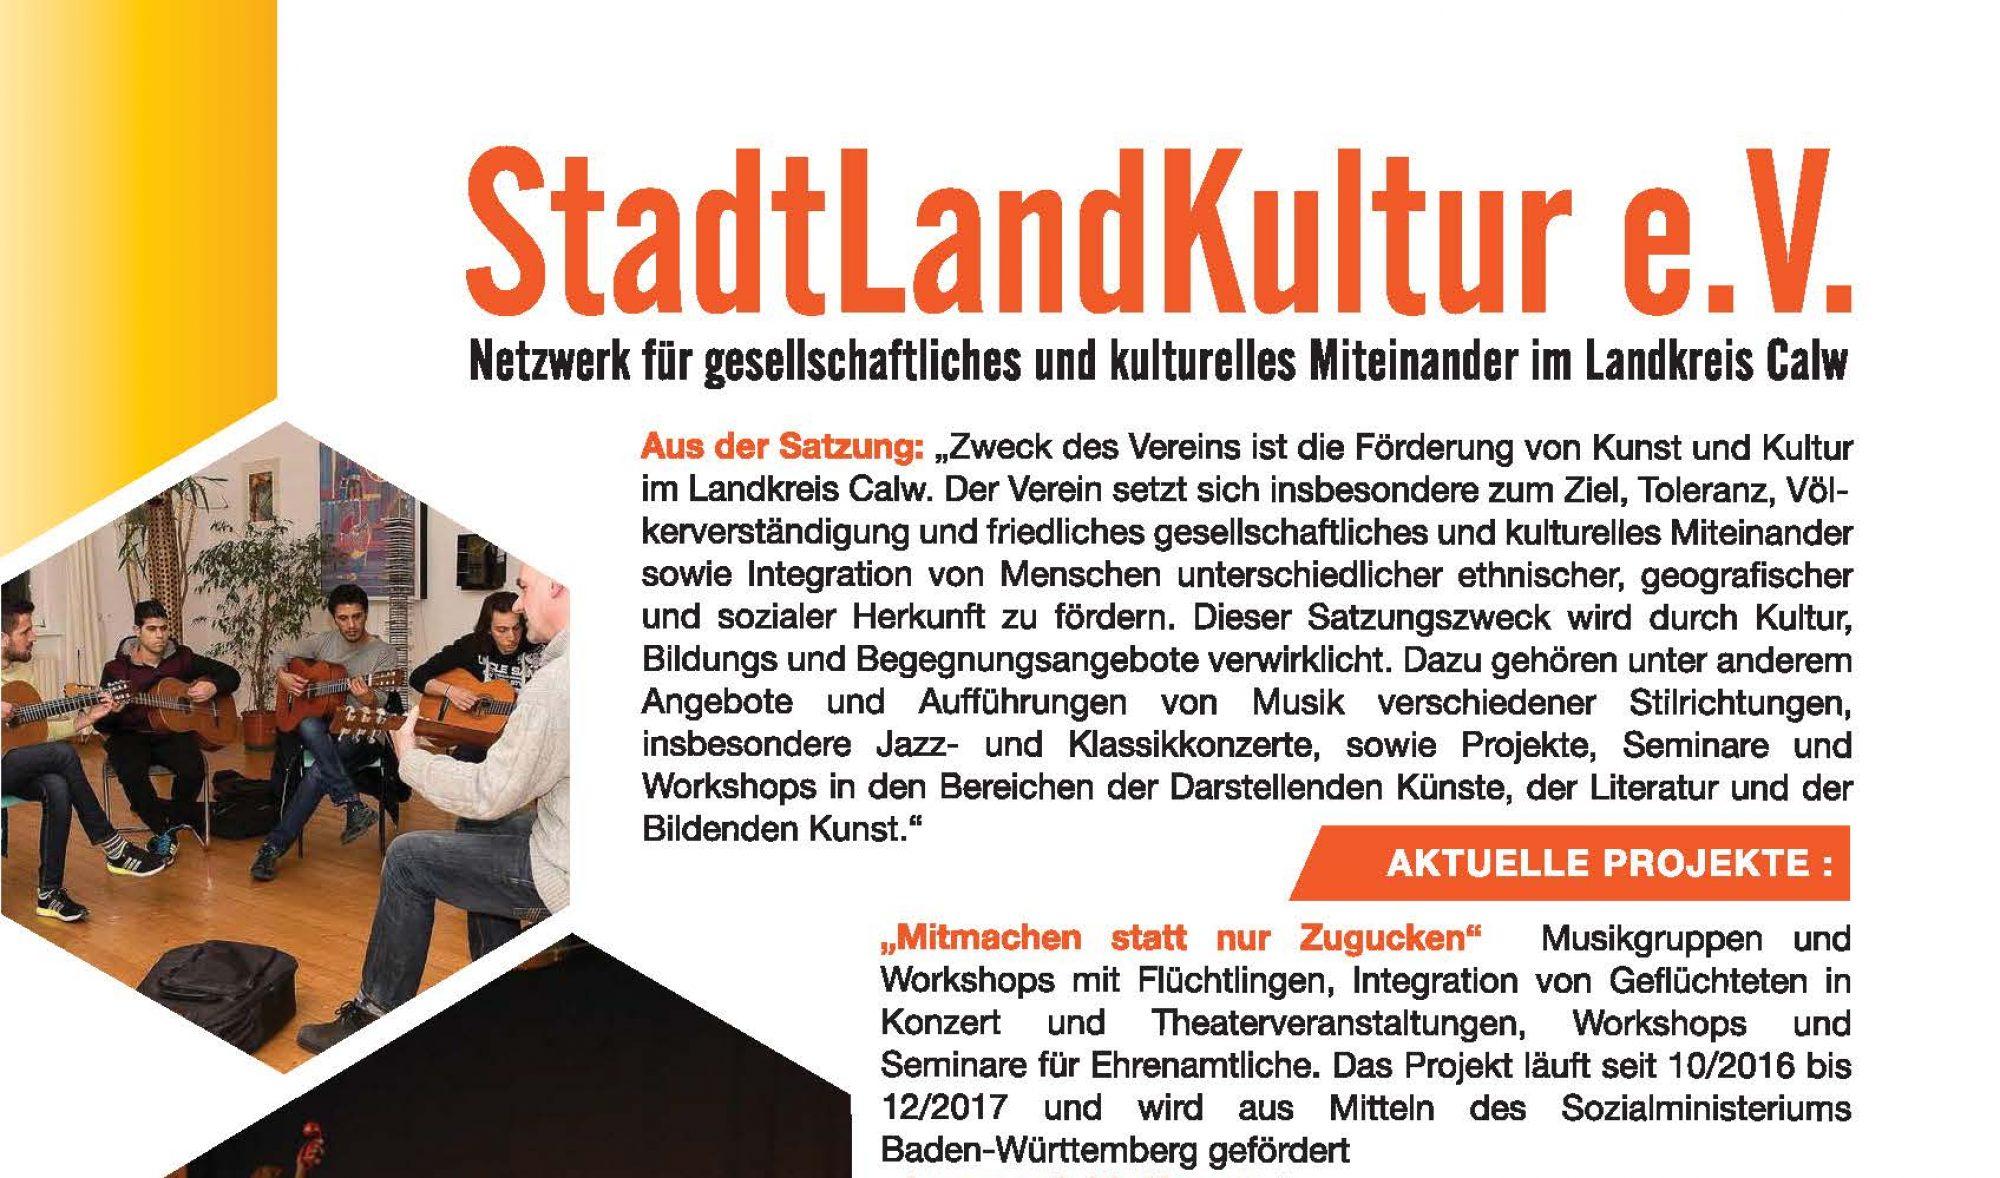 StadtLandKultur e.V.